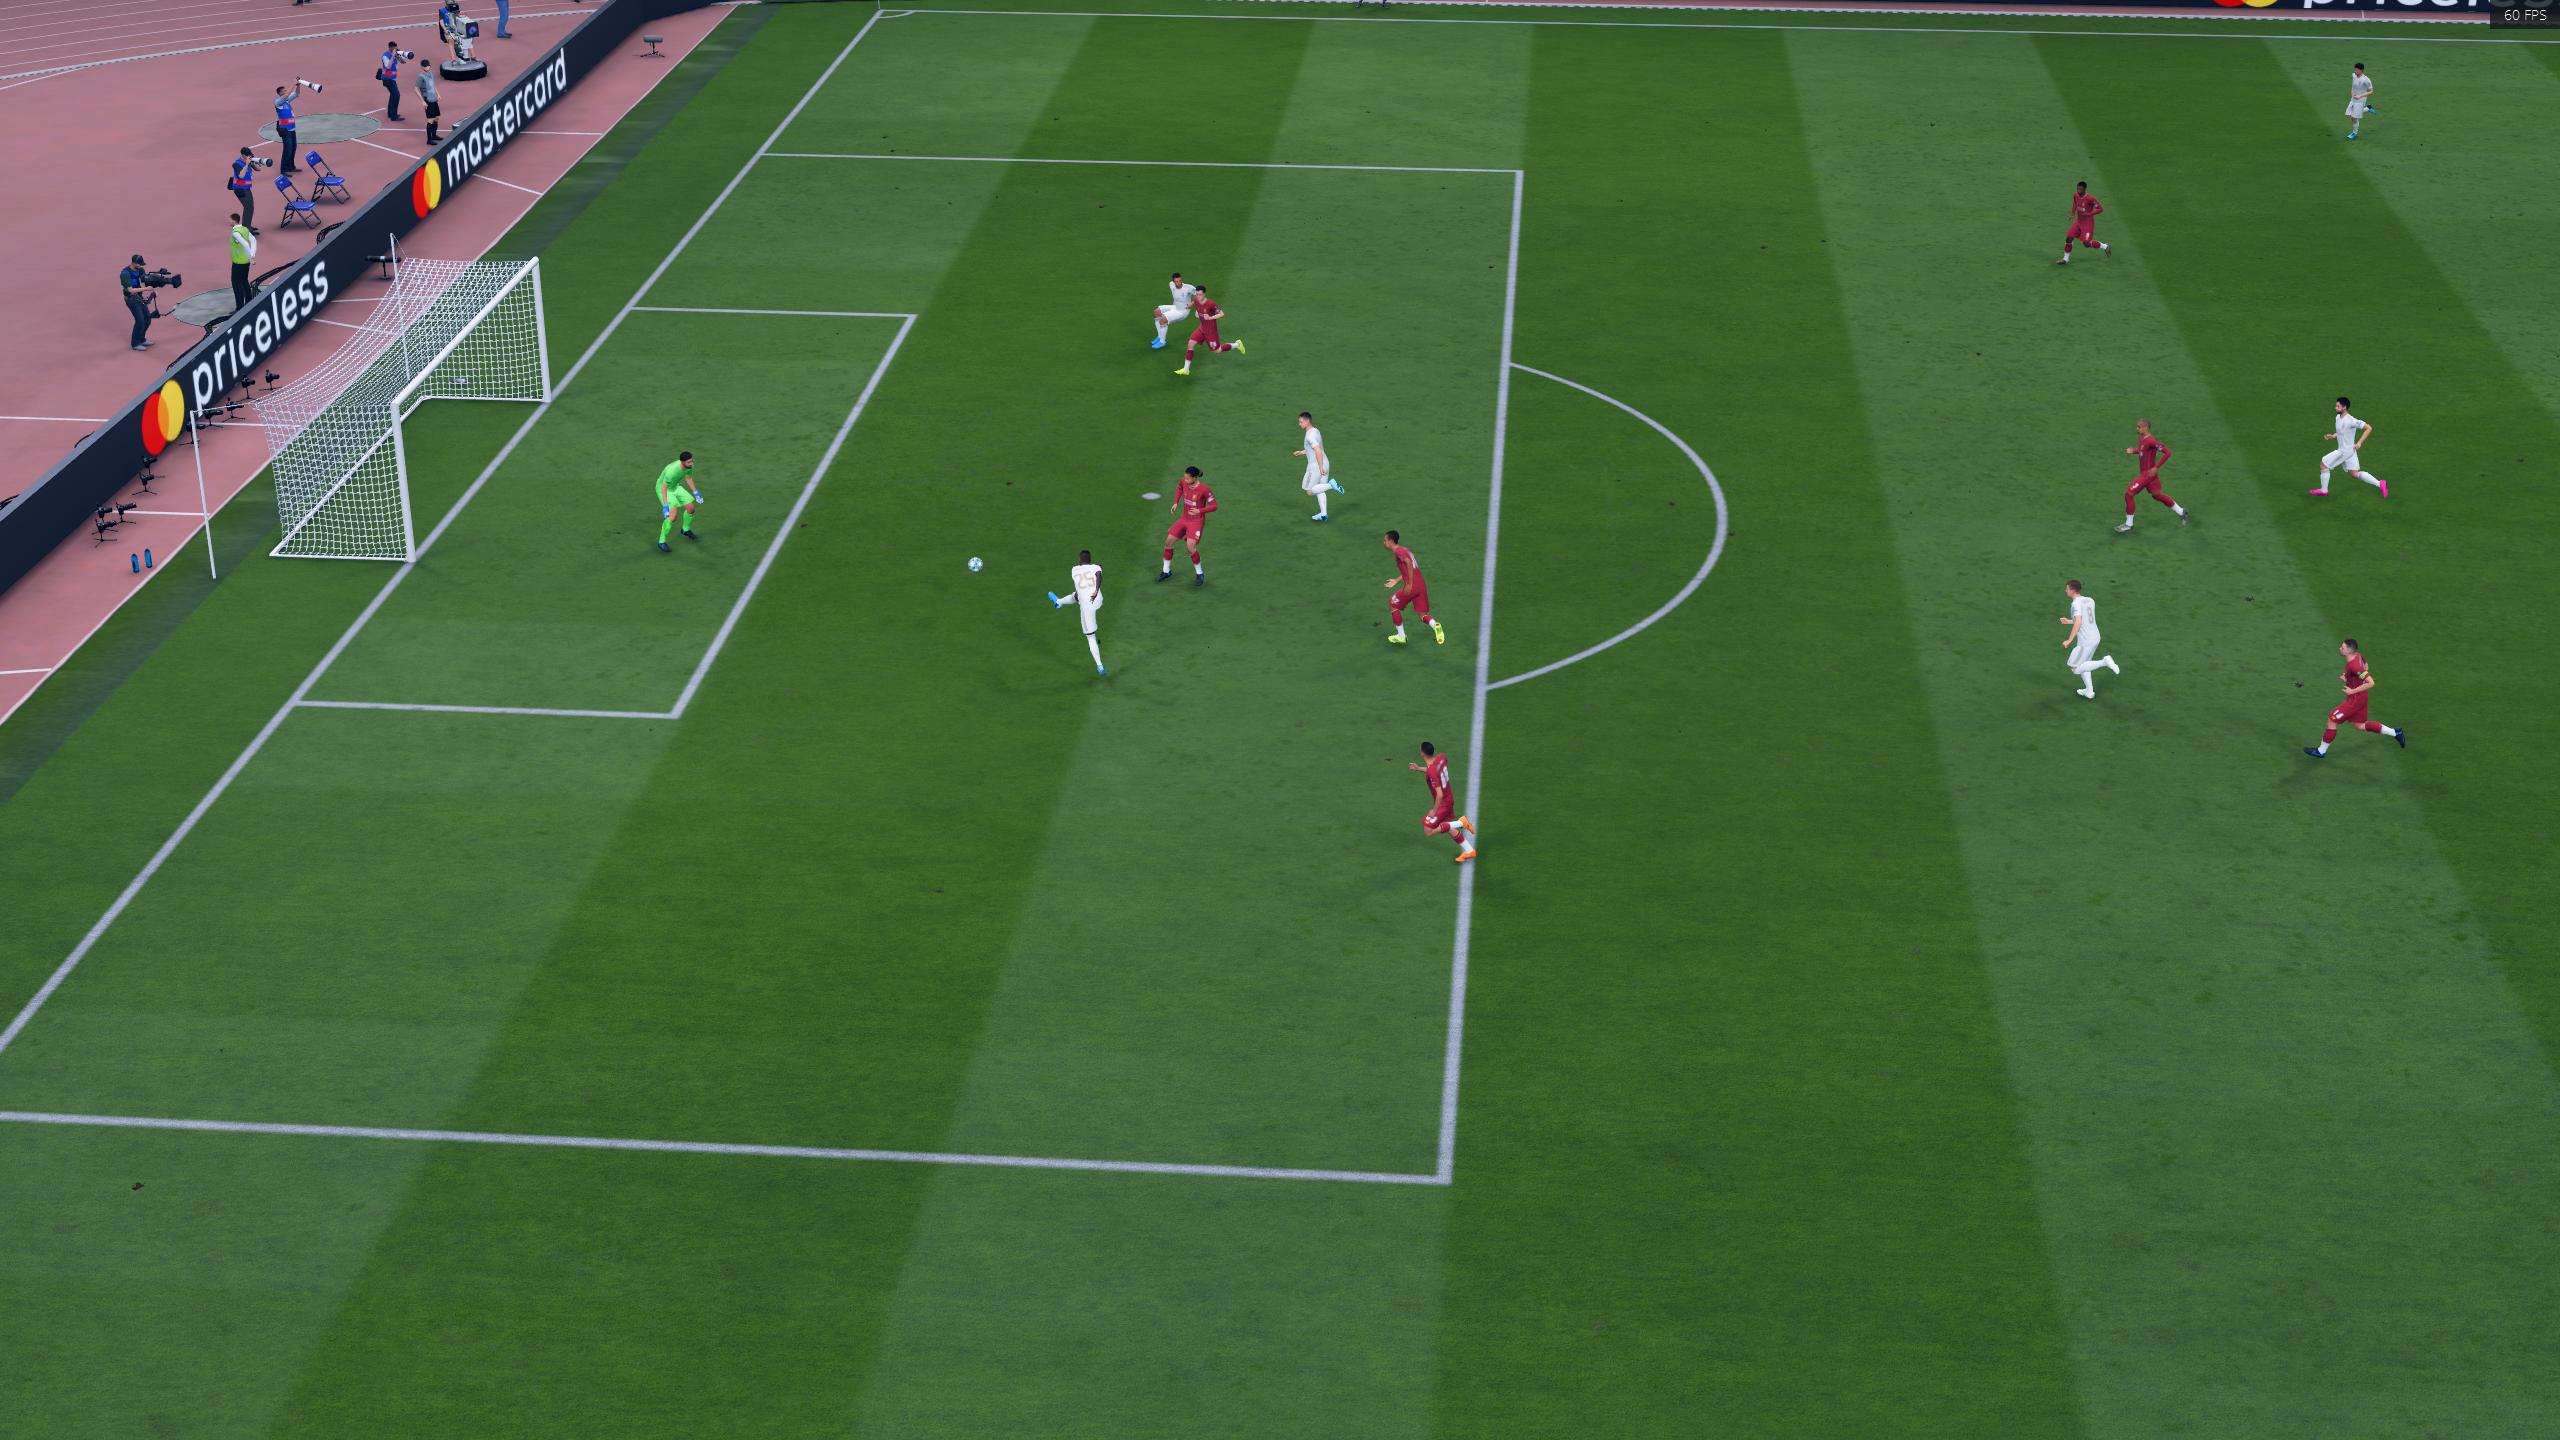 FIFA 20 Screenshot 2019.12.04 - 00.23.09.23